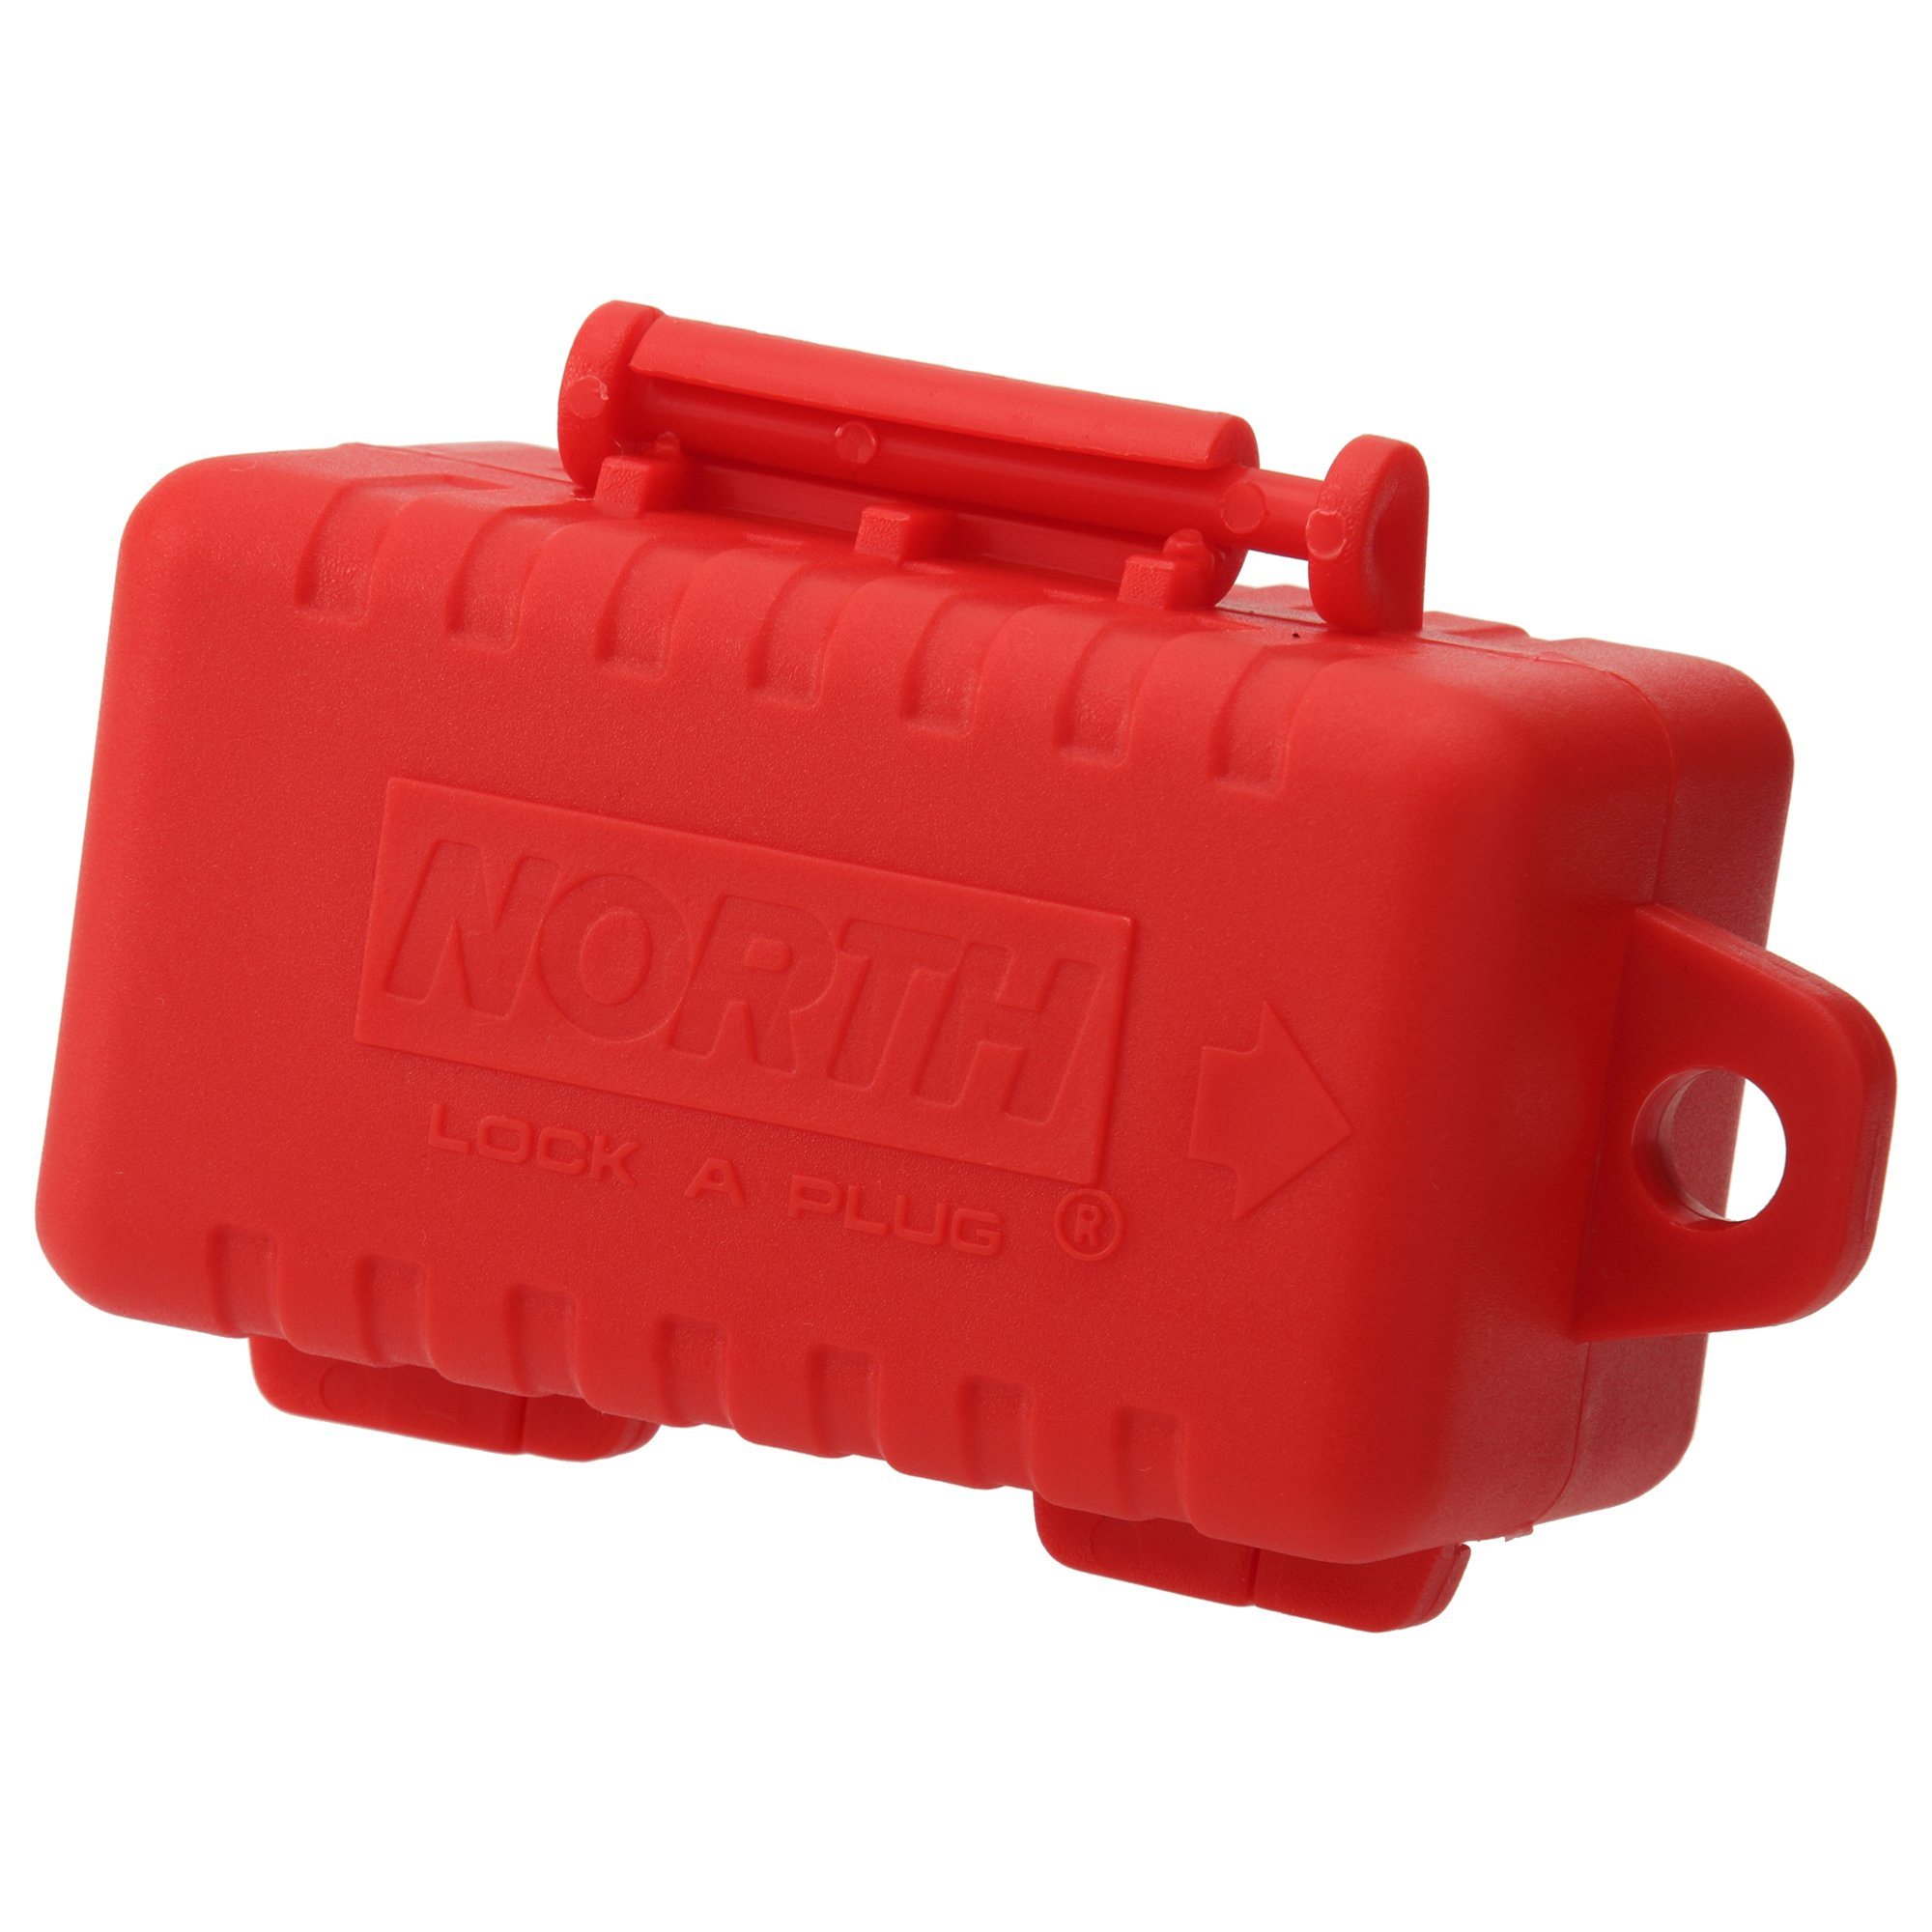 Panduit PSL-CL480 240-480 Volt AC Cord Lockout Device, Red